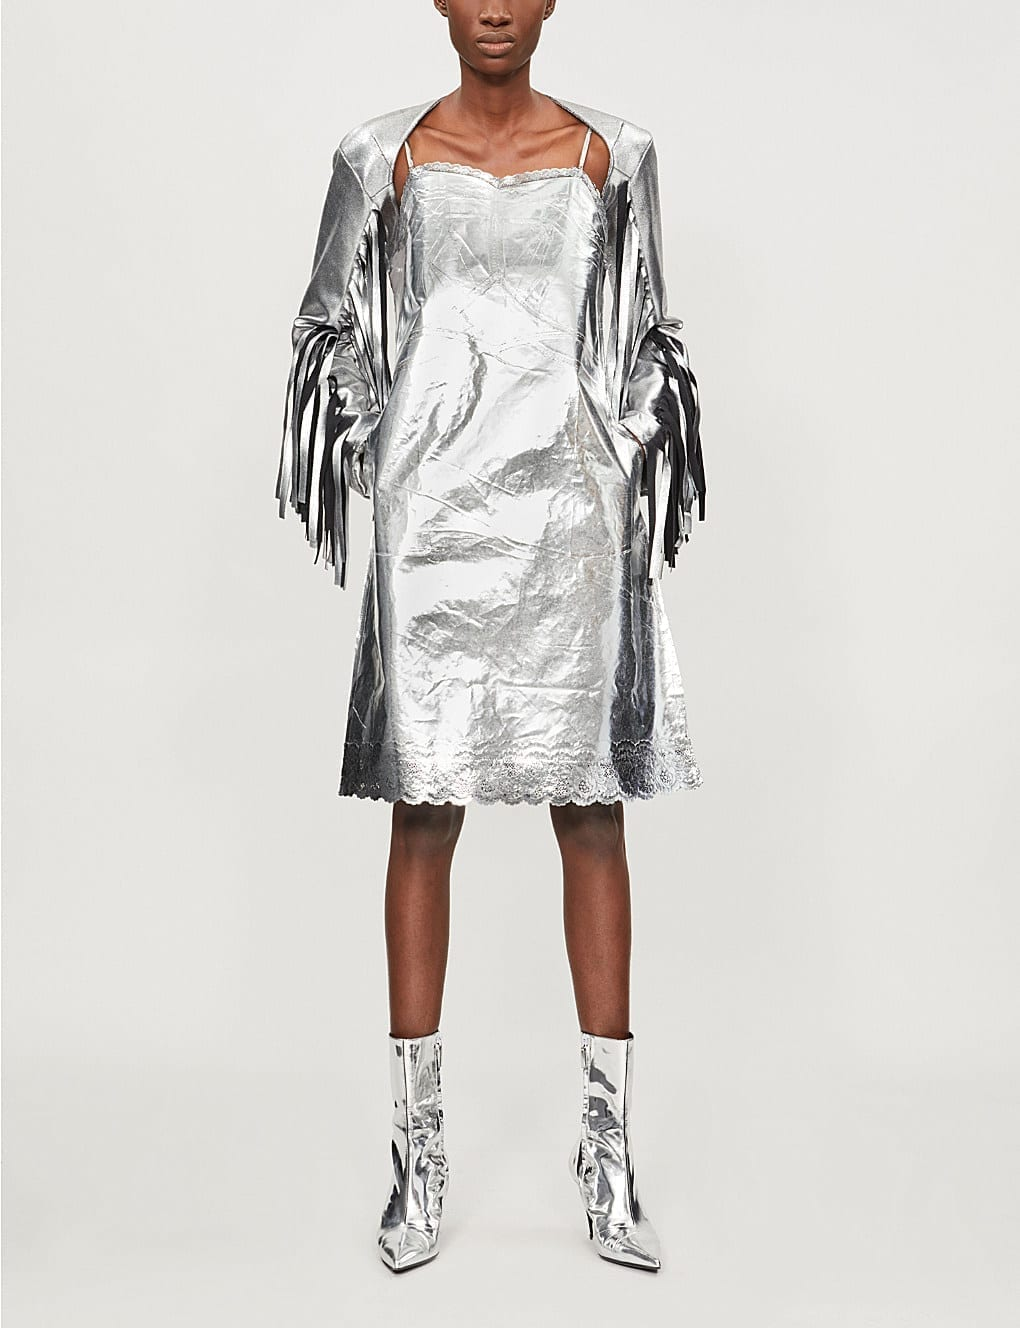 MM6 MAISON MARGIELA Lace-Trim Metallic Dress